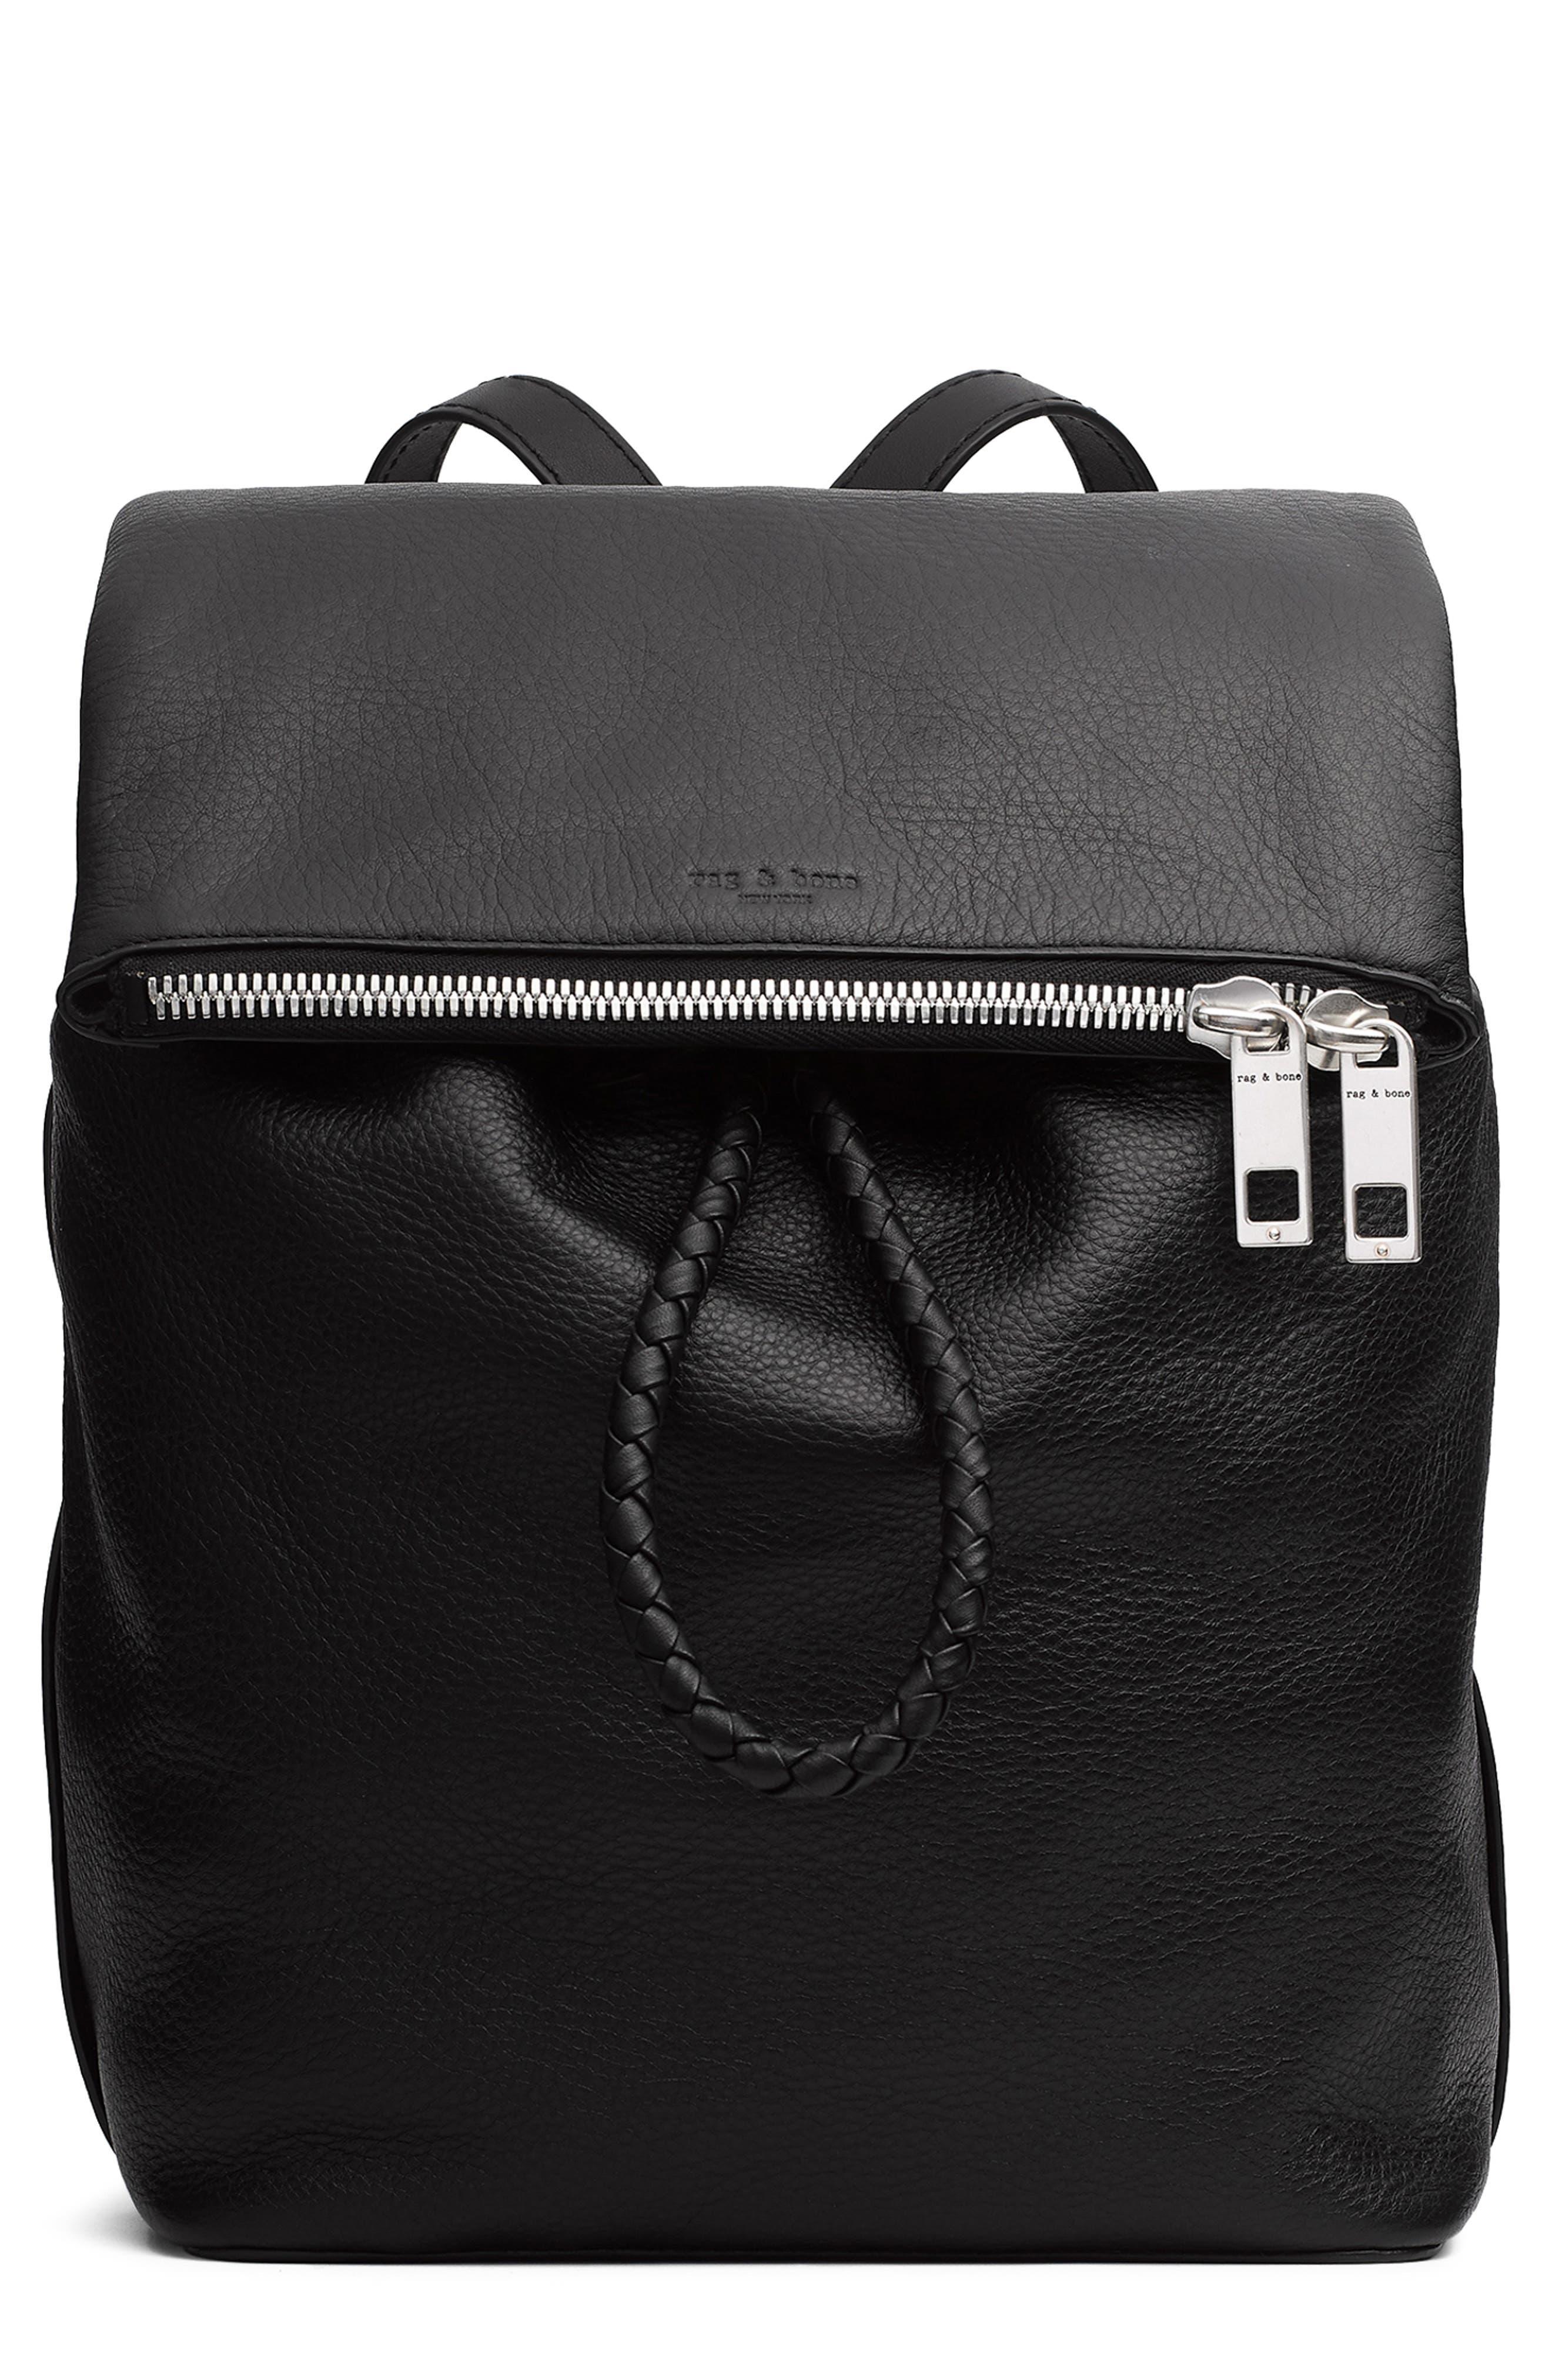 RAG & BONE,                             Loner Leather Backpack,                             Main thumbnail 1, color,                             BLACK